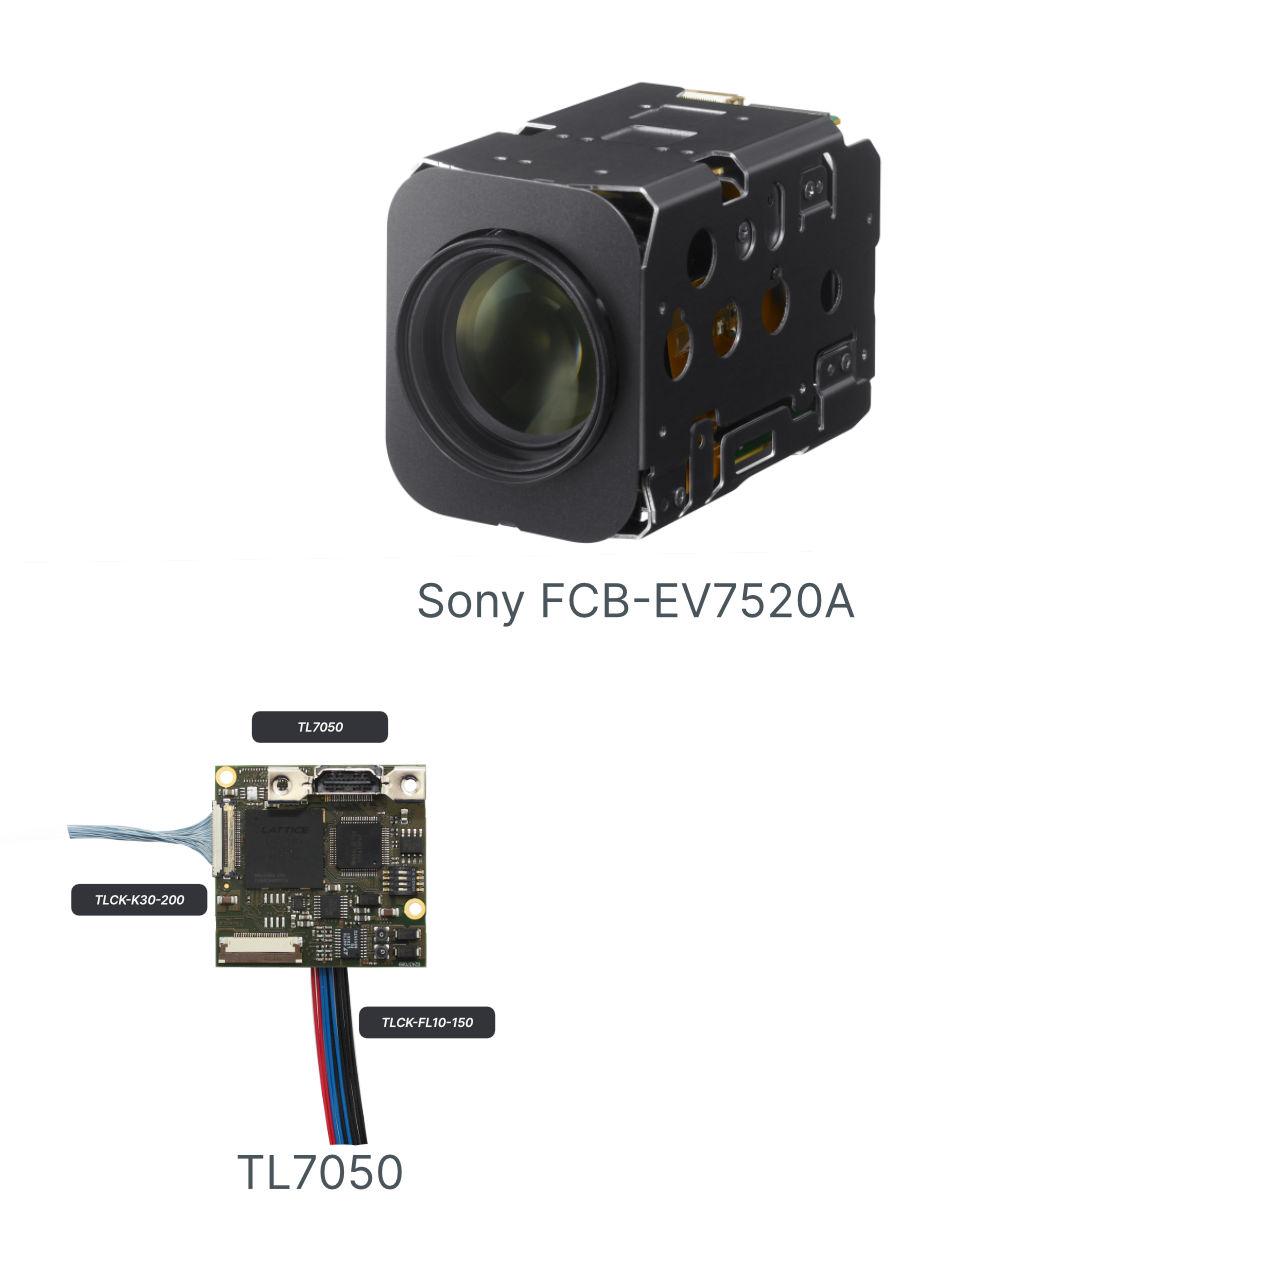 TL7050 | Dual HD-SDI and HDMI Interface